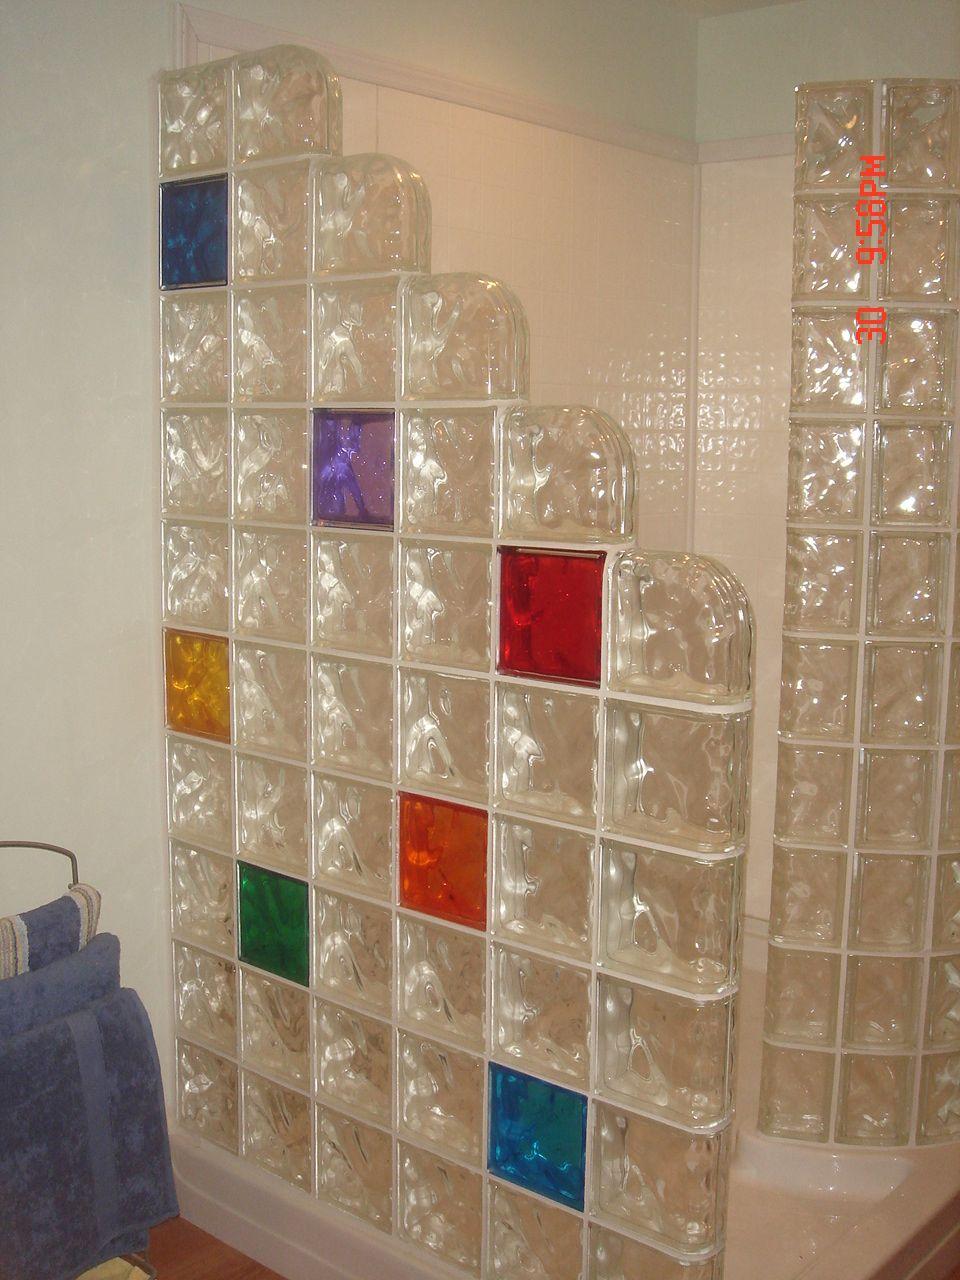 Glass Block Shower Stall With Colored Glass Blocks Steklobloki